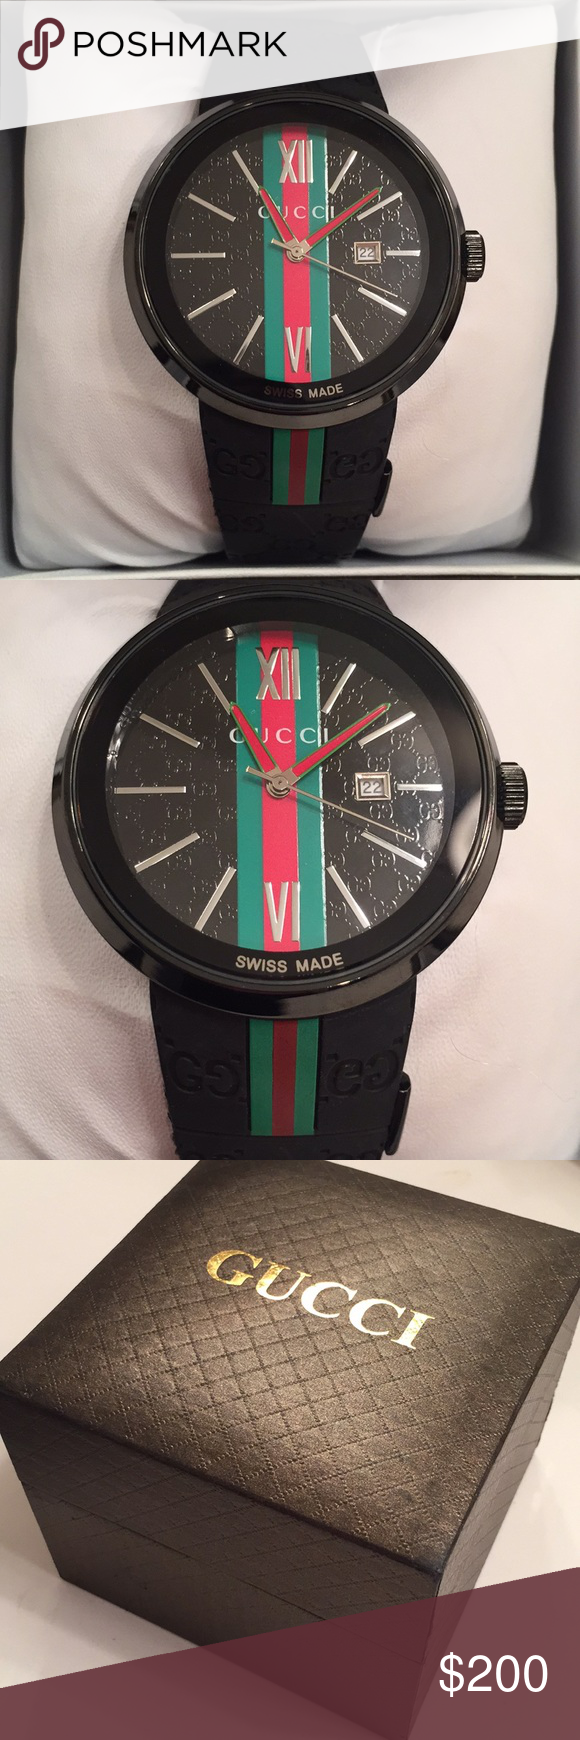 6632ddf762e Gucci watch Black rubber watch